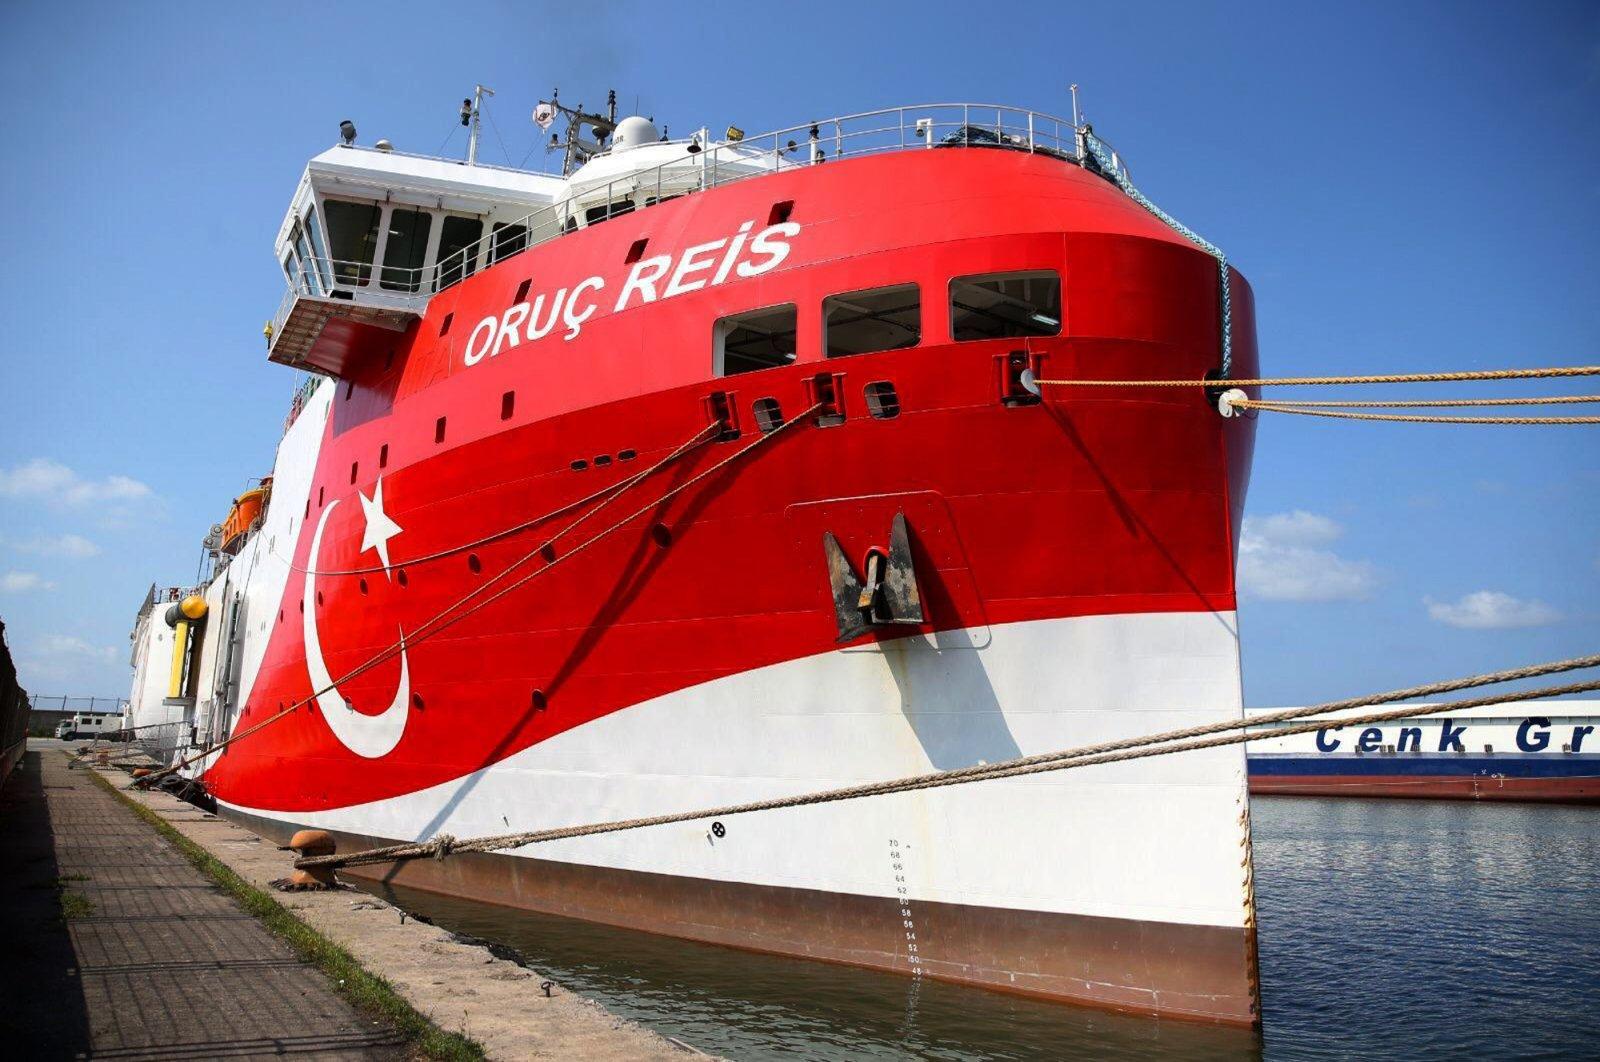 Turkish research vessel Oruc Reis in Antalya, southwestern Turkey, July 23, 2020. (AP Photo)